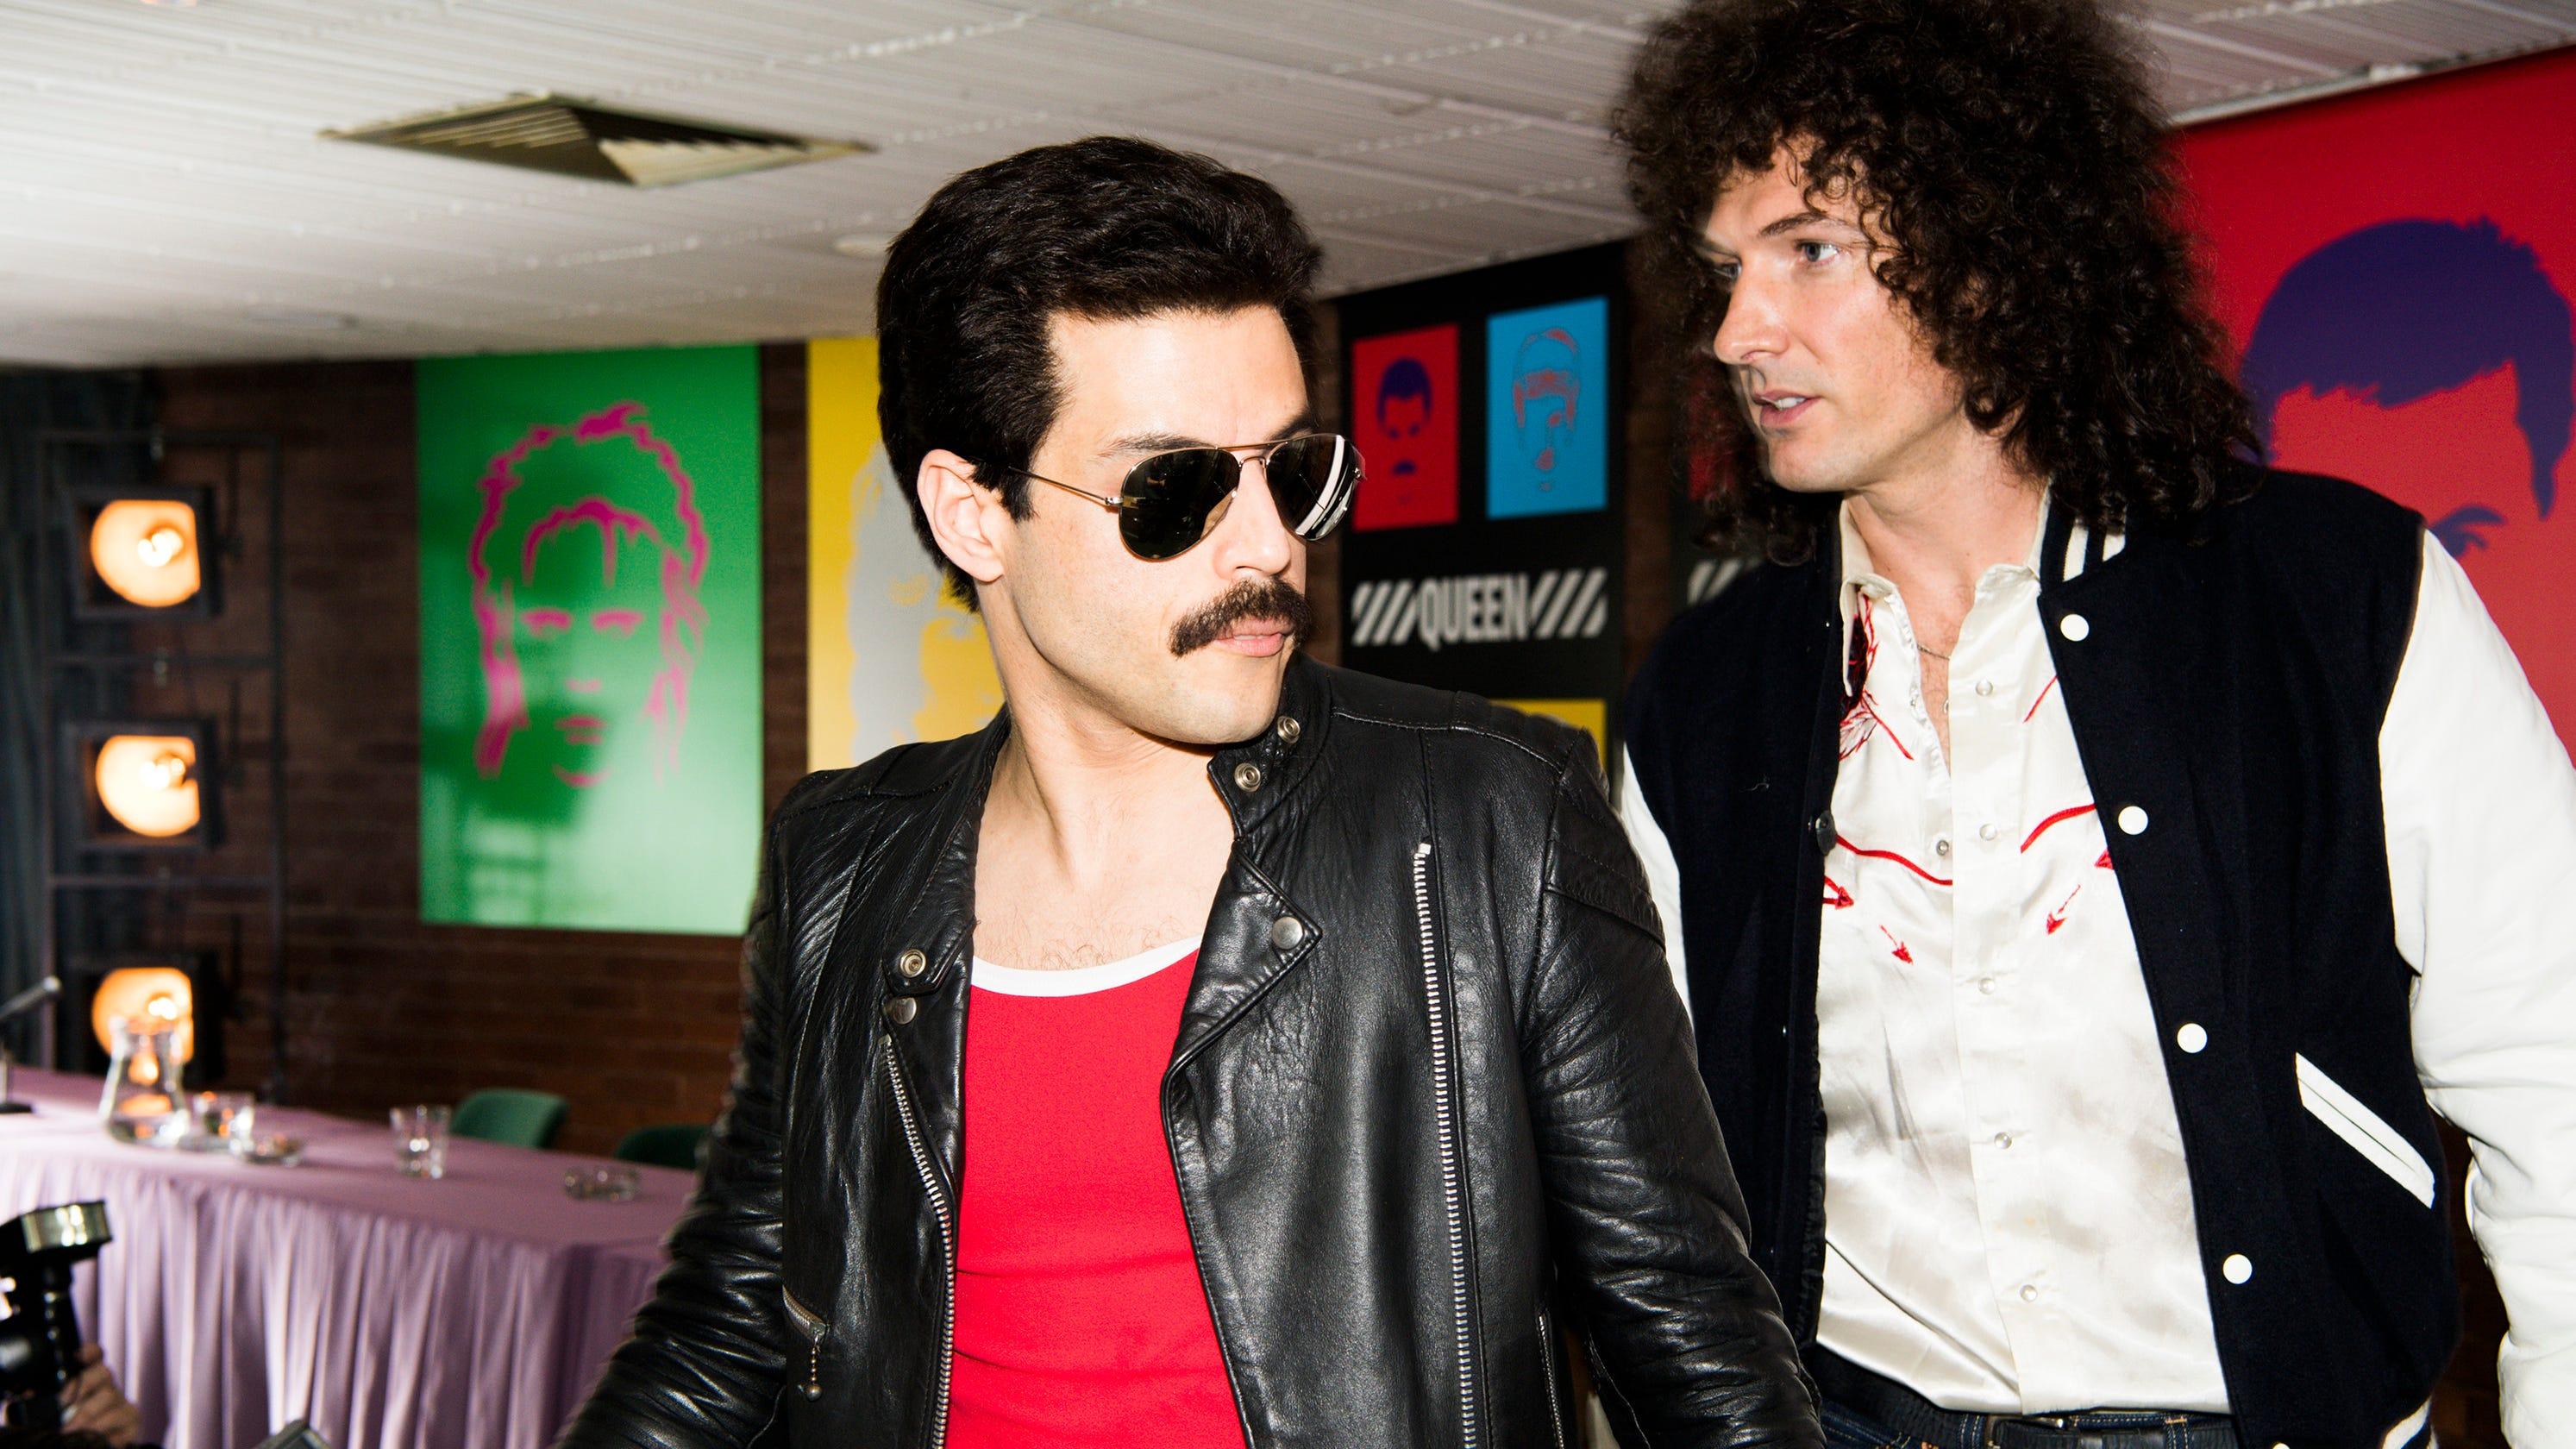 Rami Malek Gets Slams That Queen Film Straightwashes Freddie Mercury